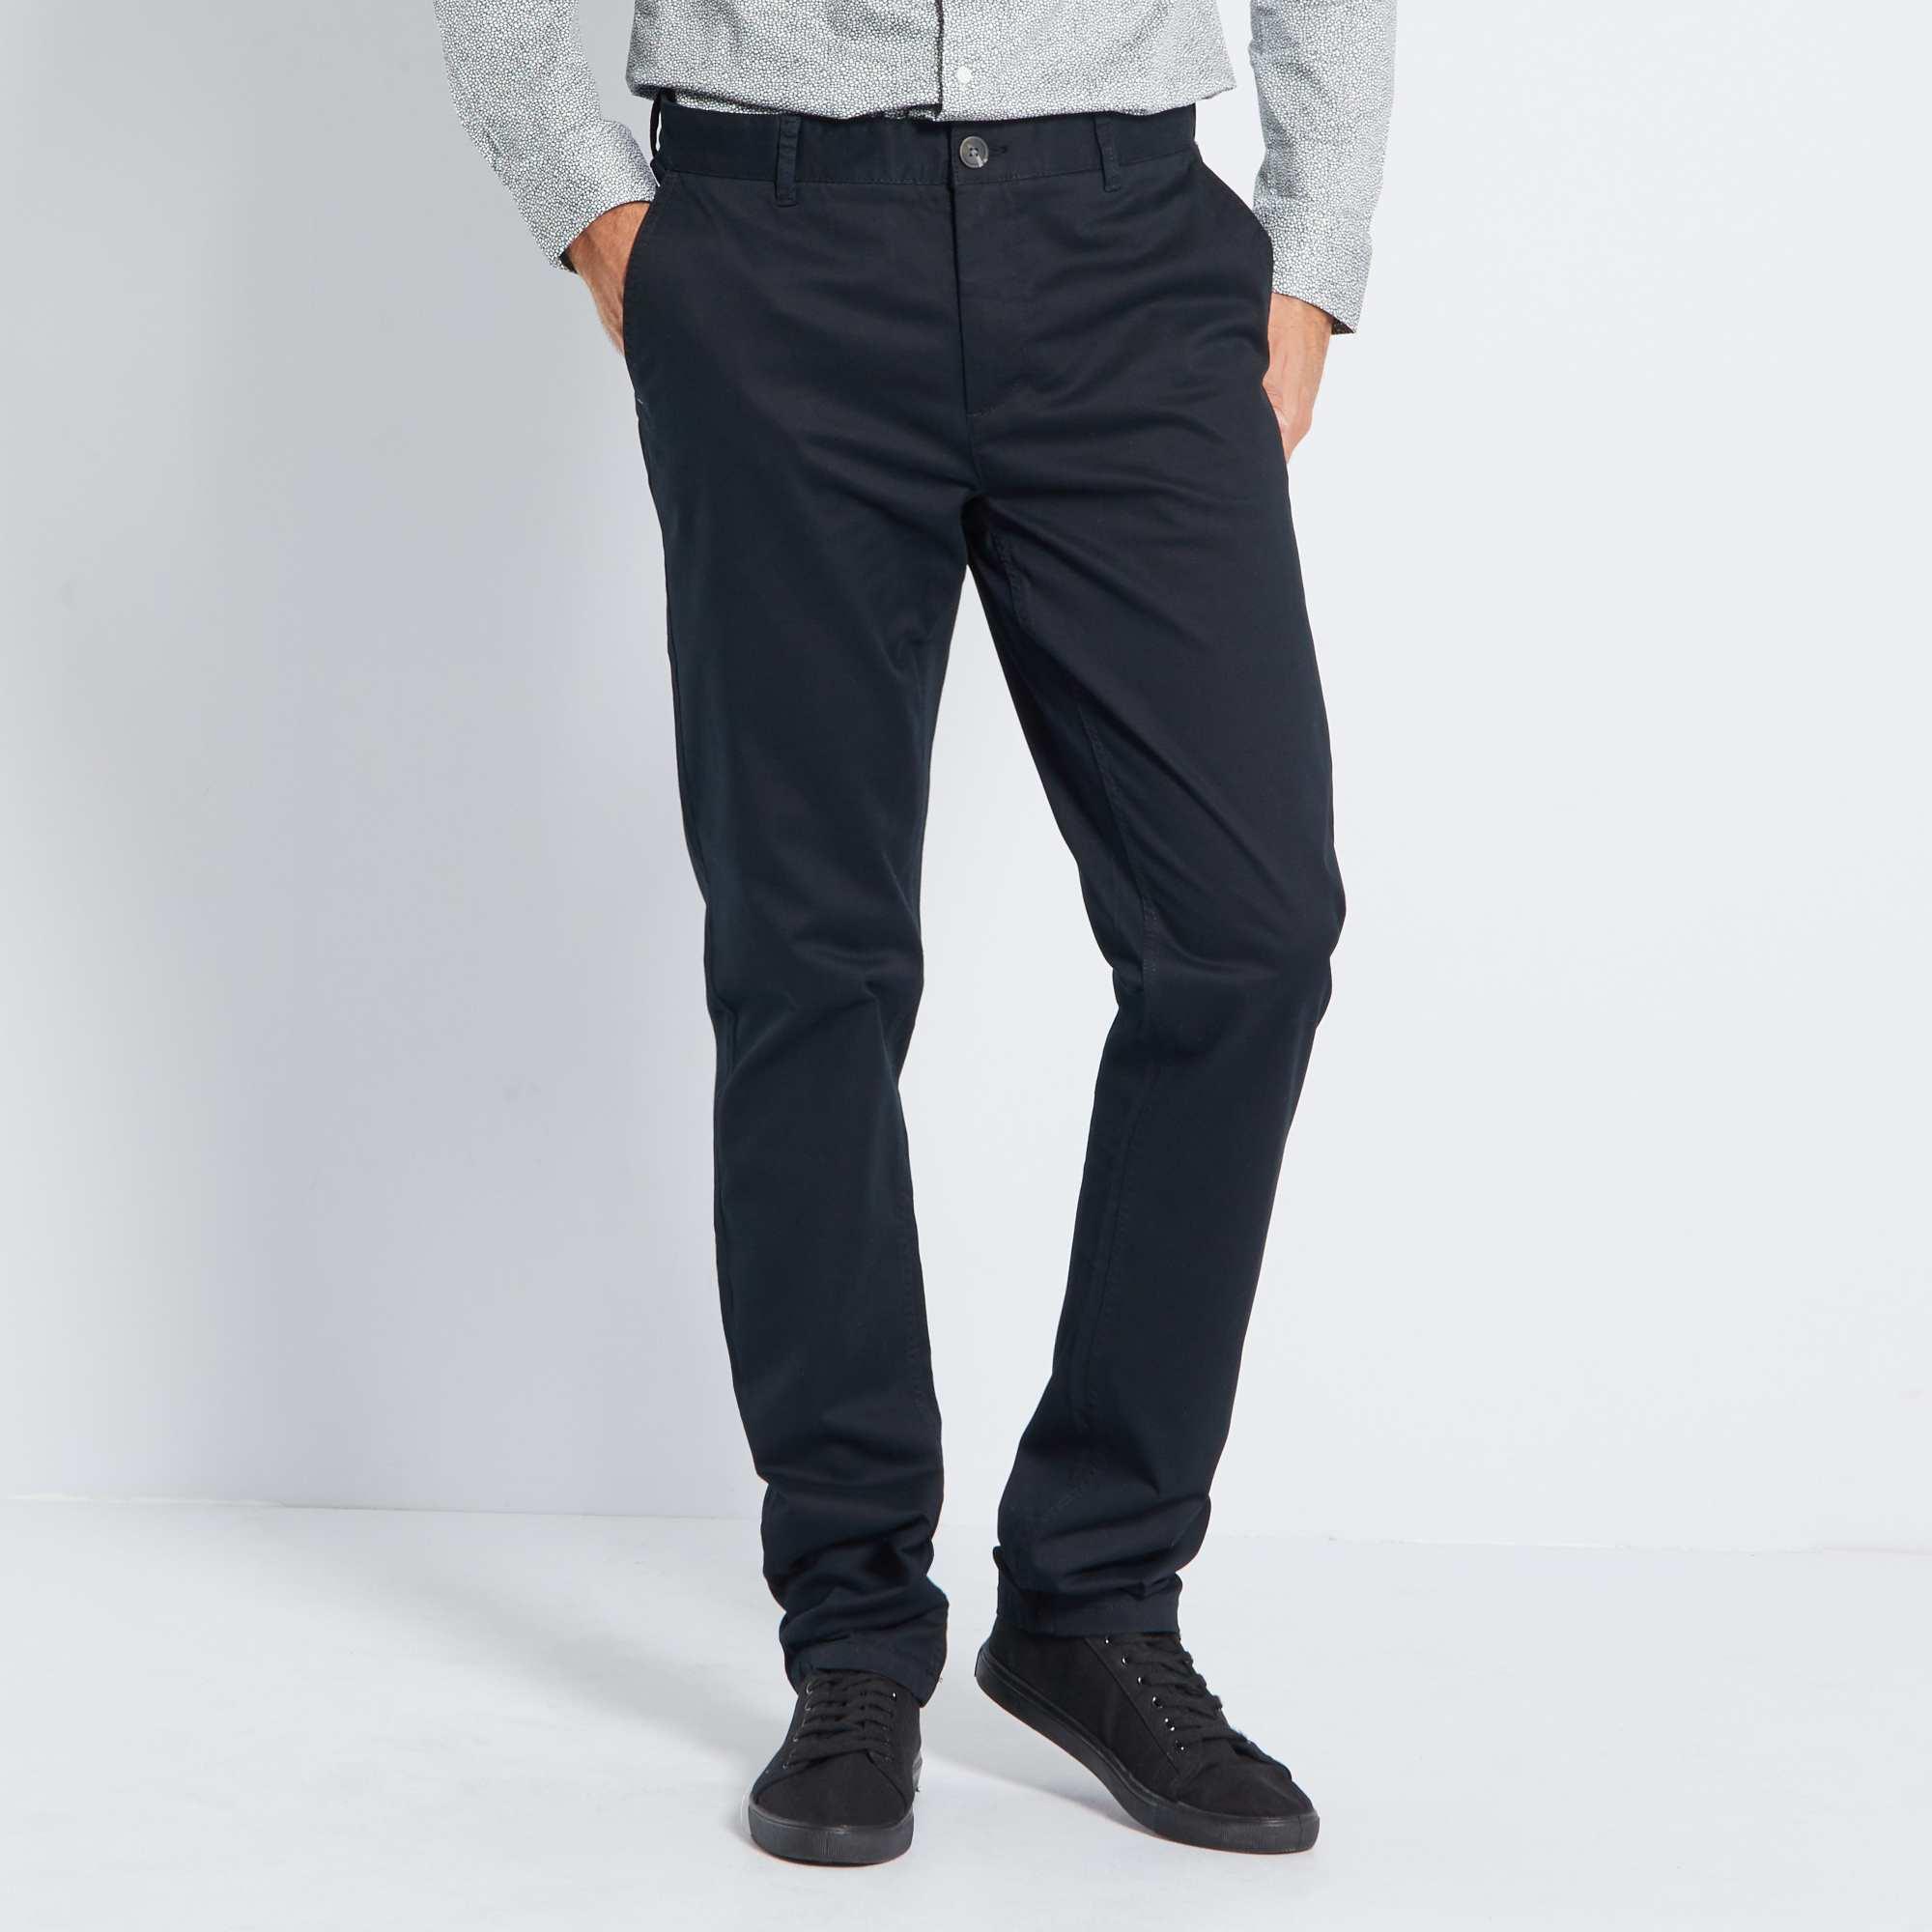 pantalon chino slim stretch l36 1m90 homme noir kiabi 22 00. Black Bedroom Furniture Sets. Home Design Ideas